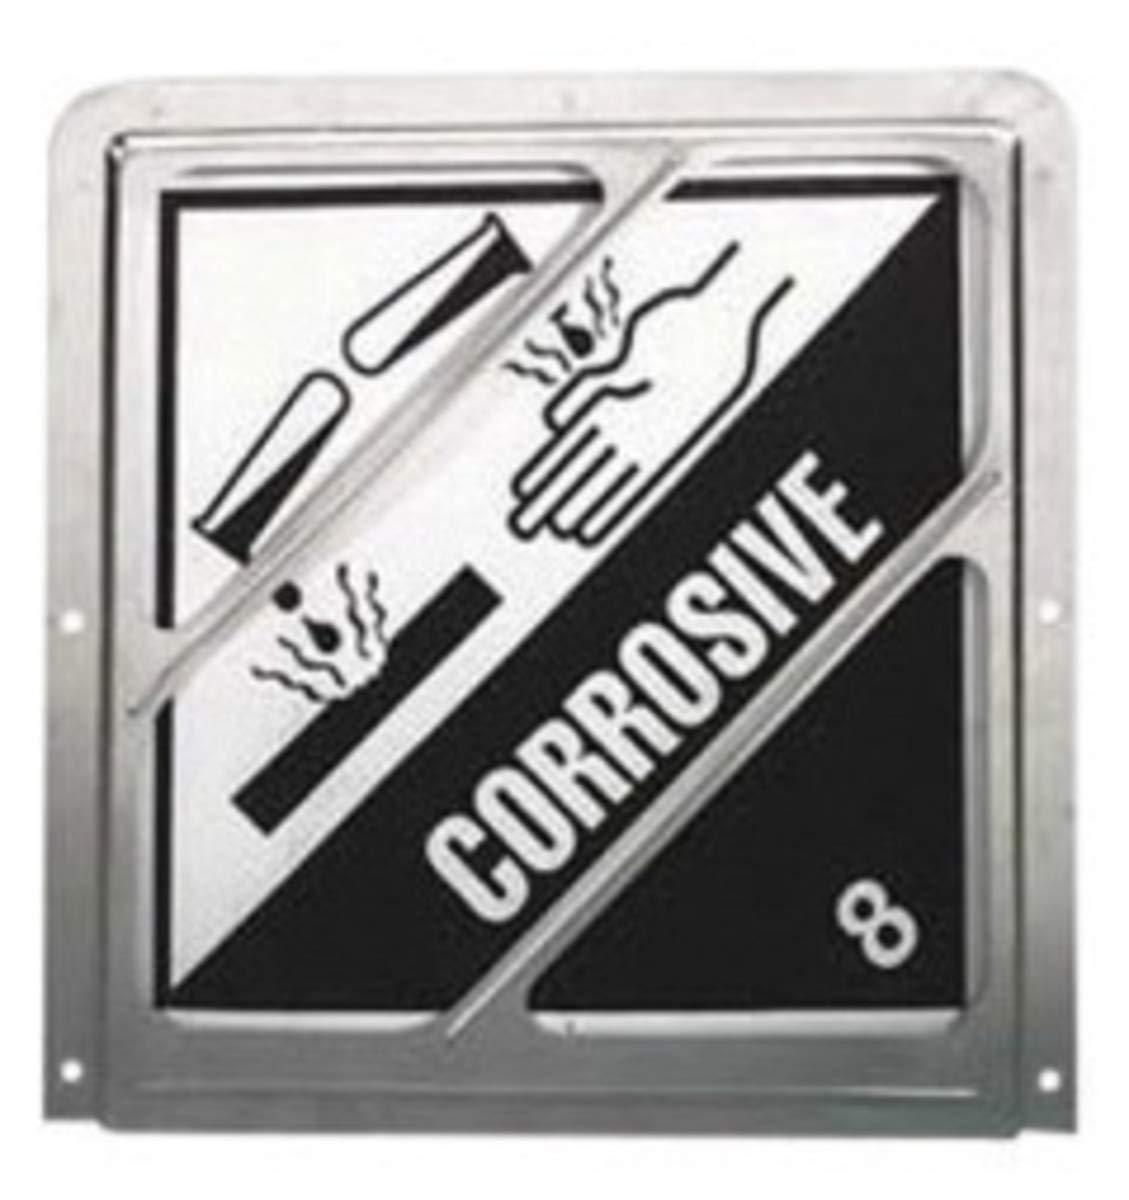 Brady 10 3/4'' X 10 3/4'' Silver Aluminum Placard Holder